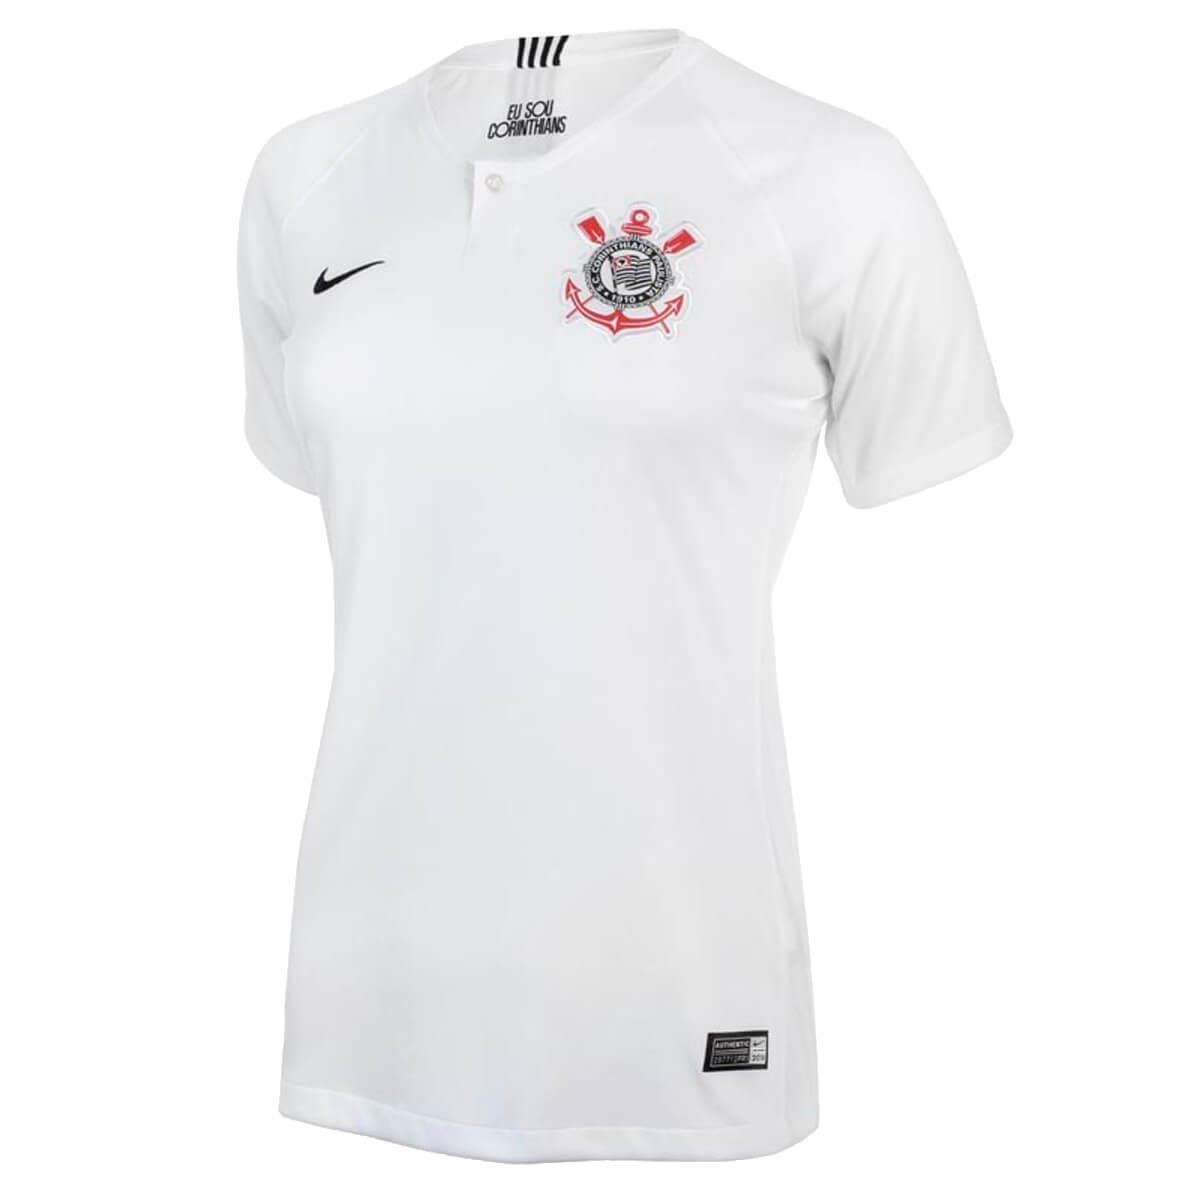 3a0ccd314 Camisa Nike Corinthians I 2018 19 Torcedor Feminina